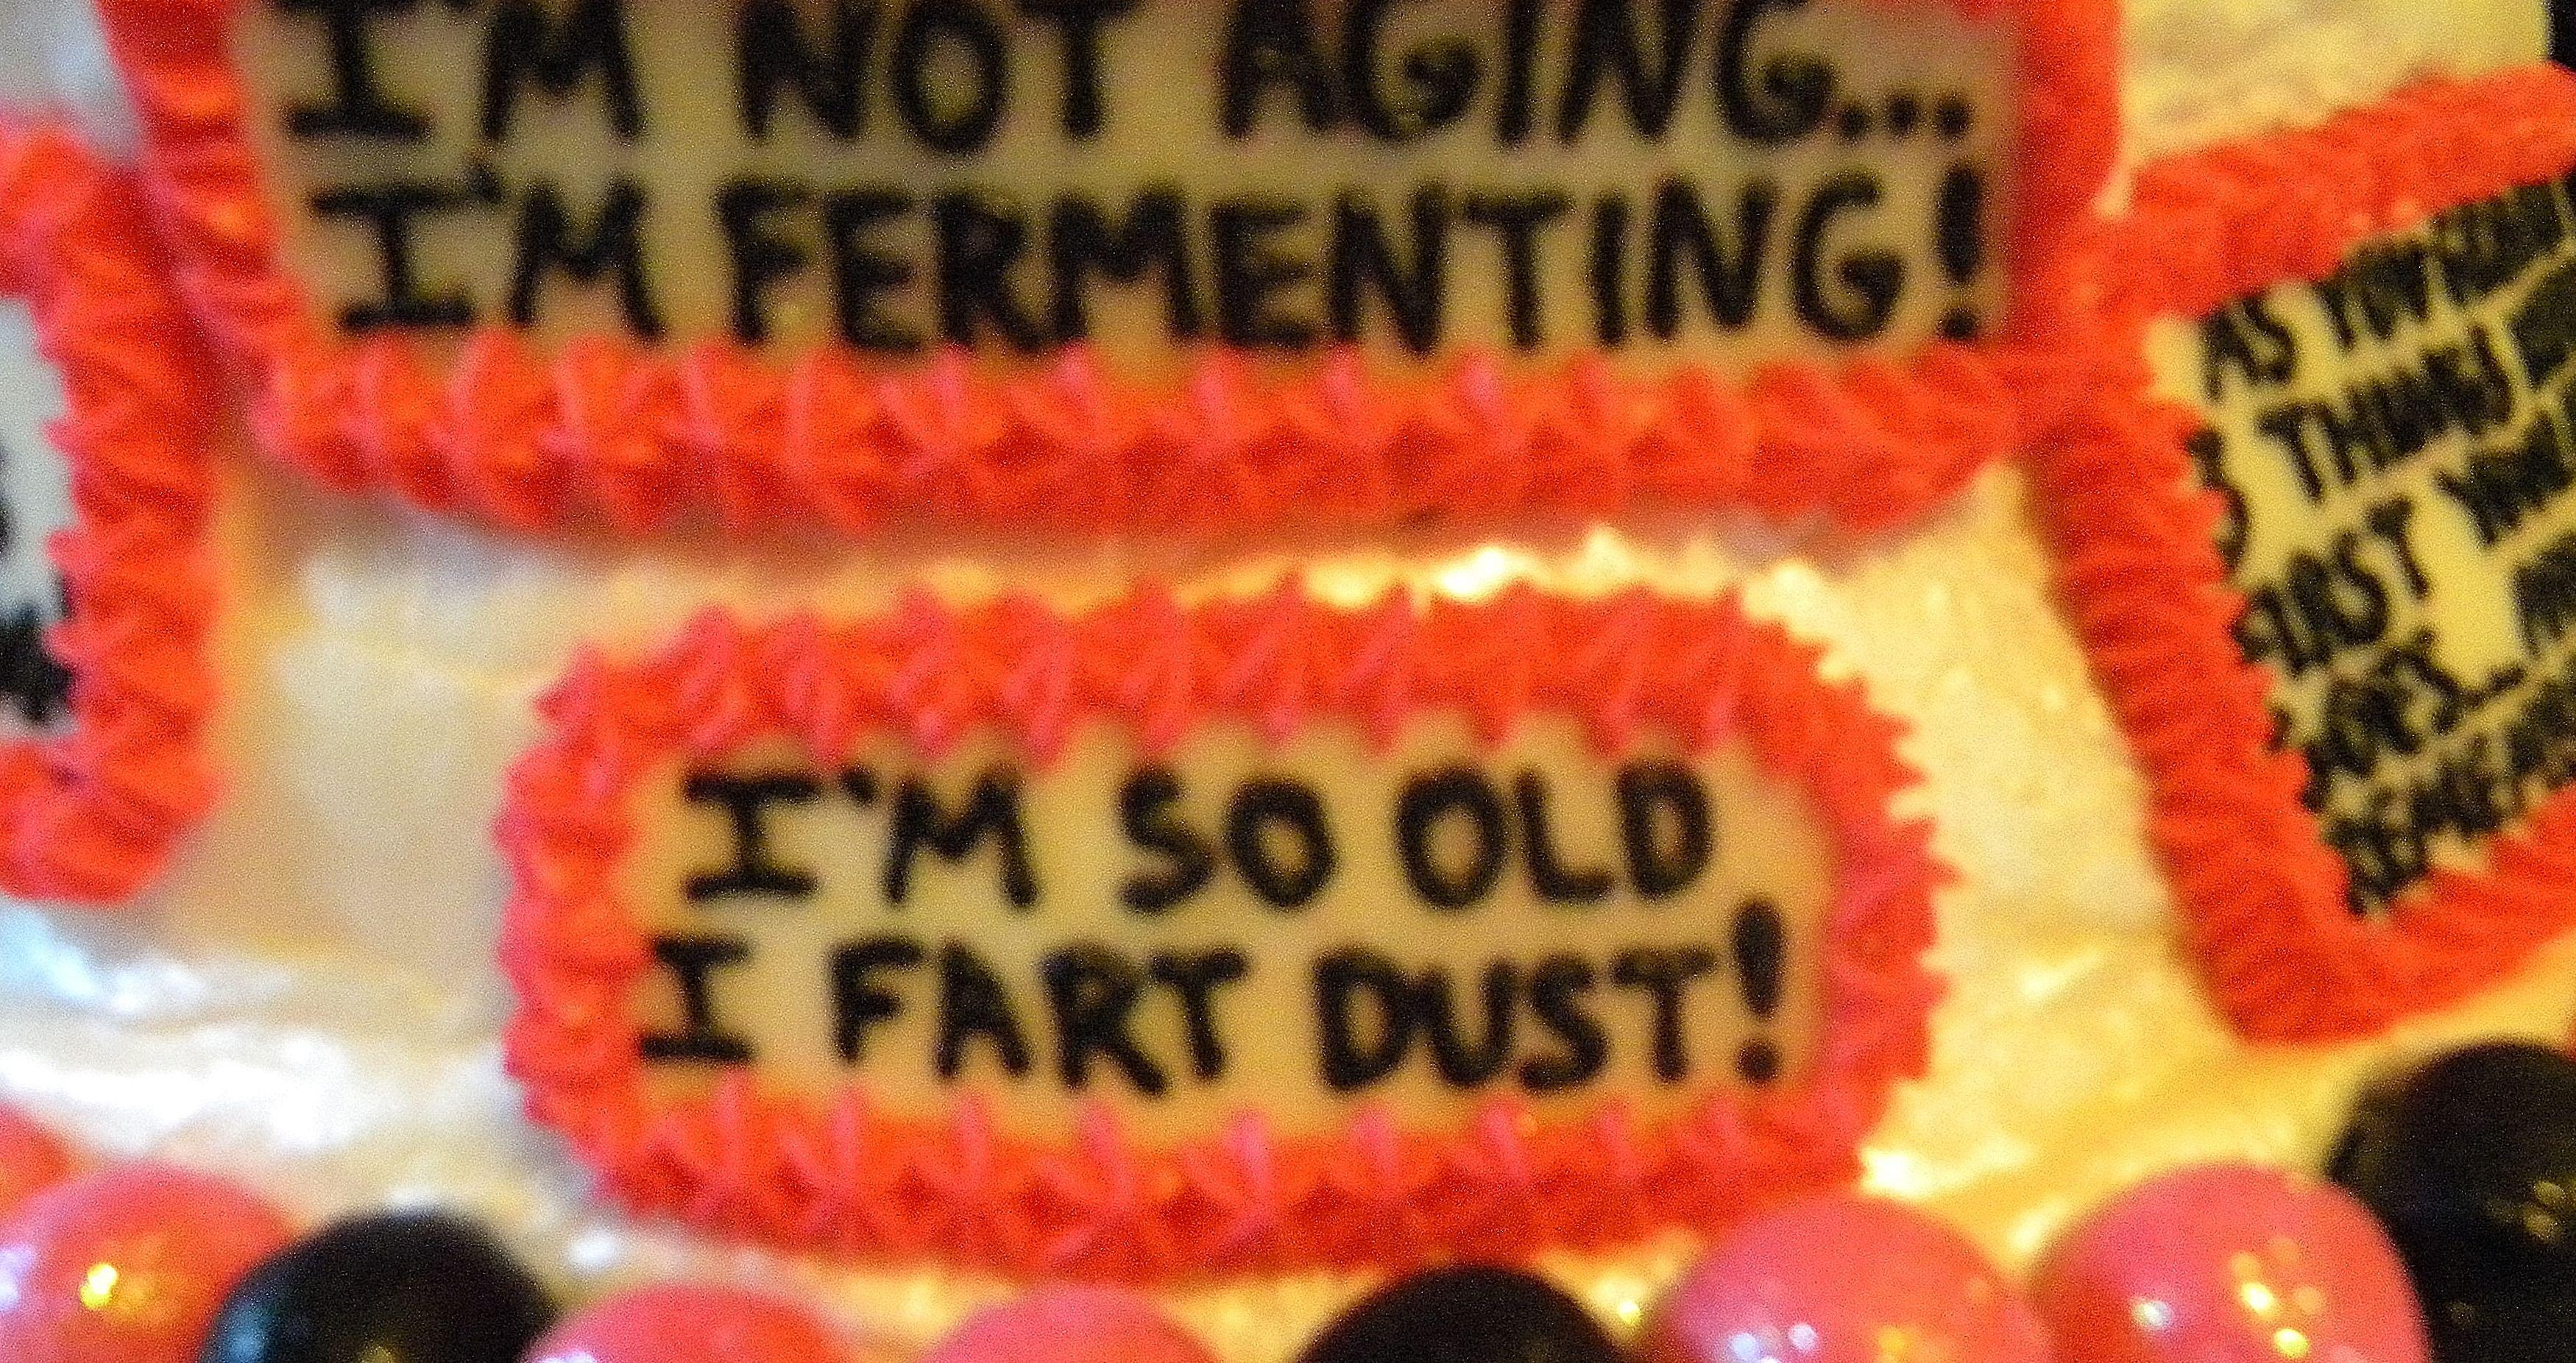 50th Birthday Cake Funny Sayings Pink Black White